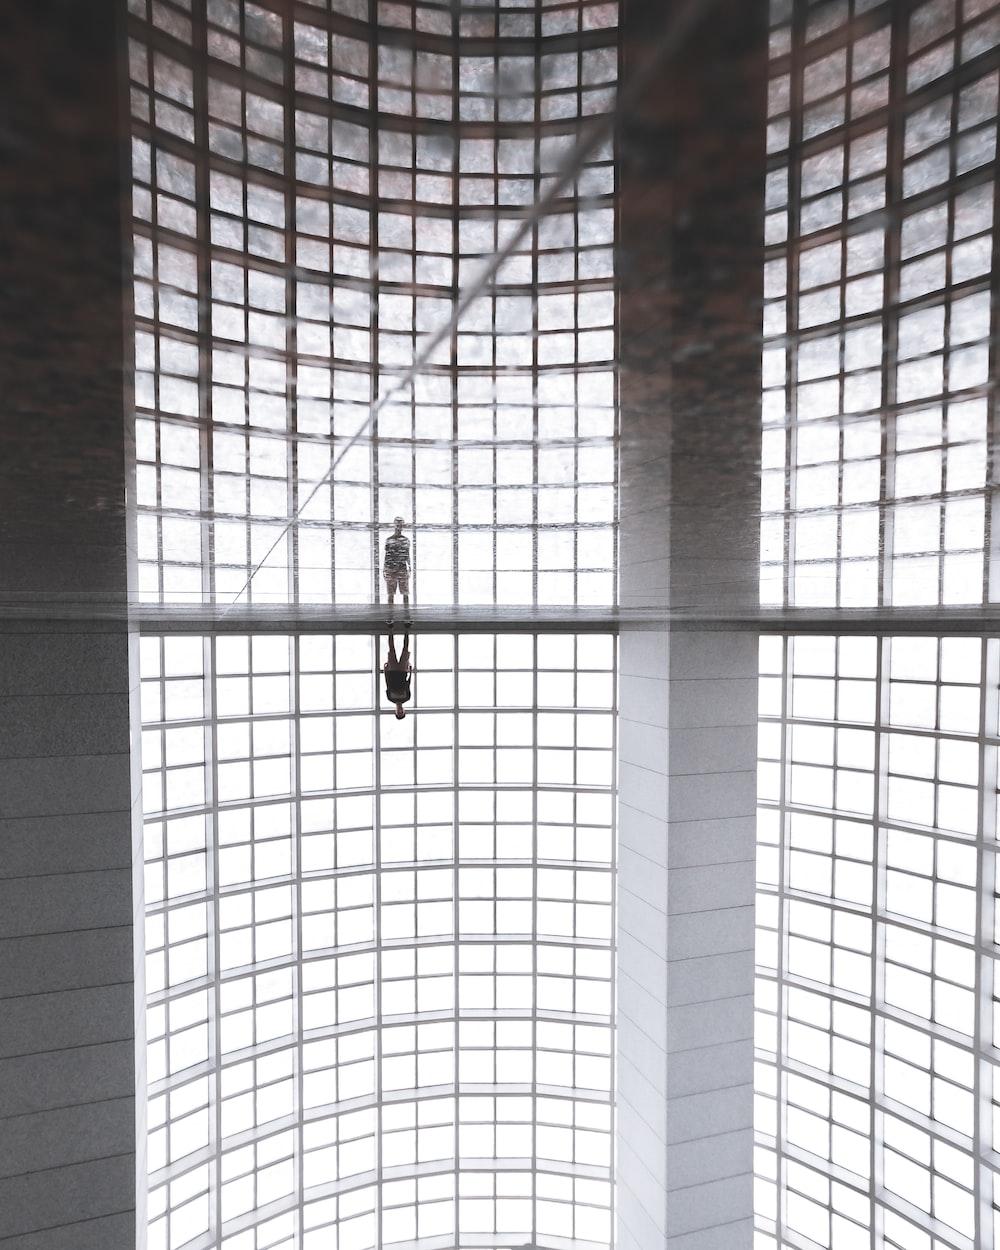 person standing inside concrete building